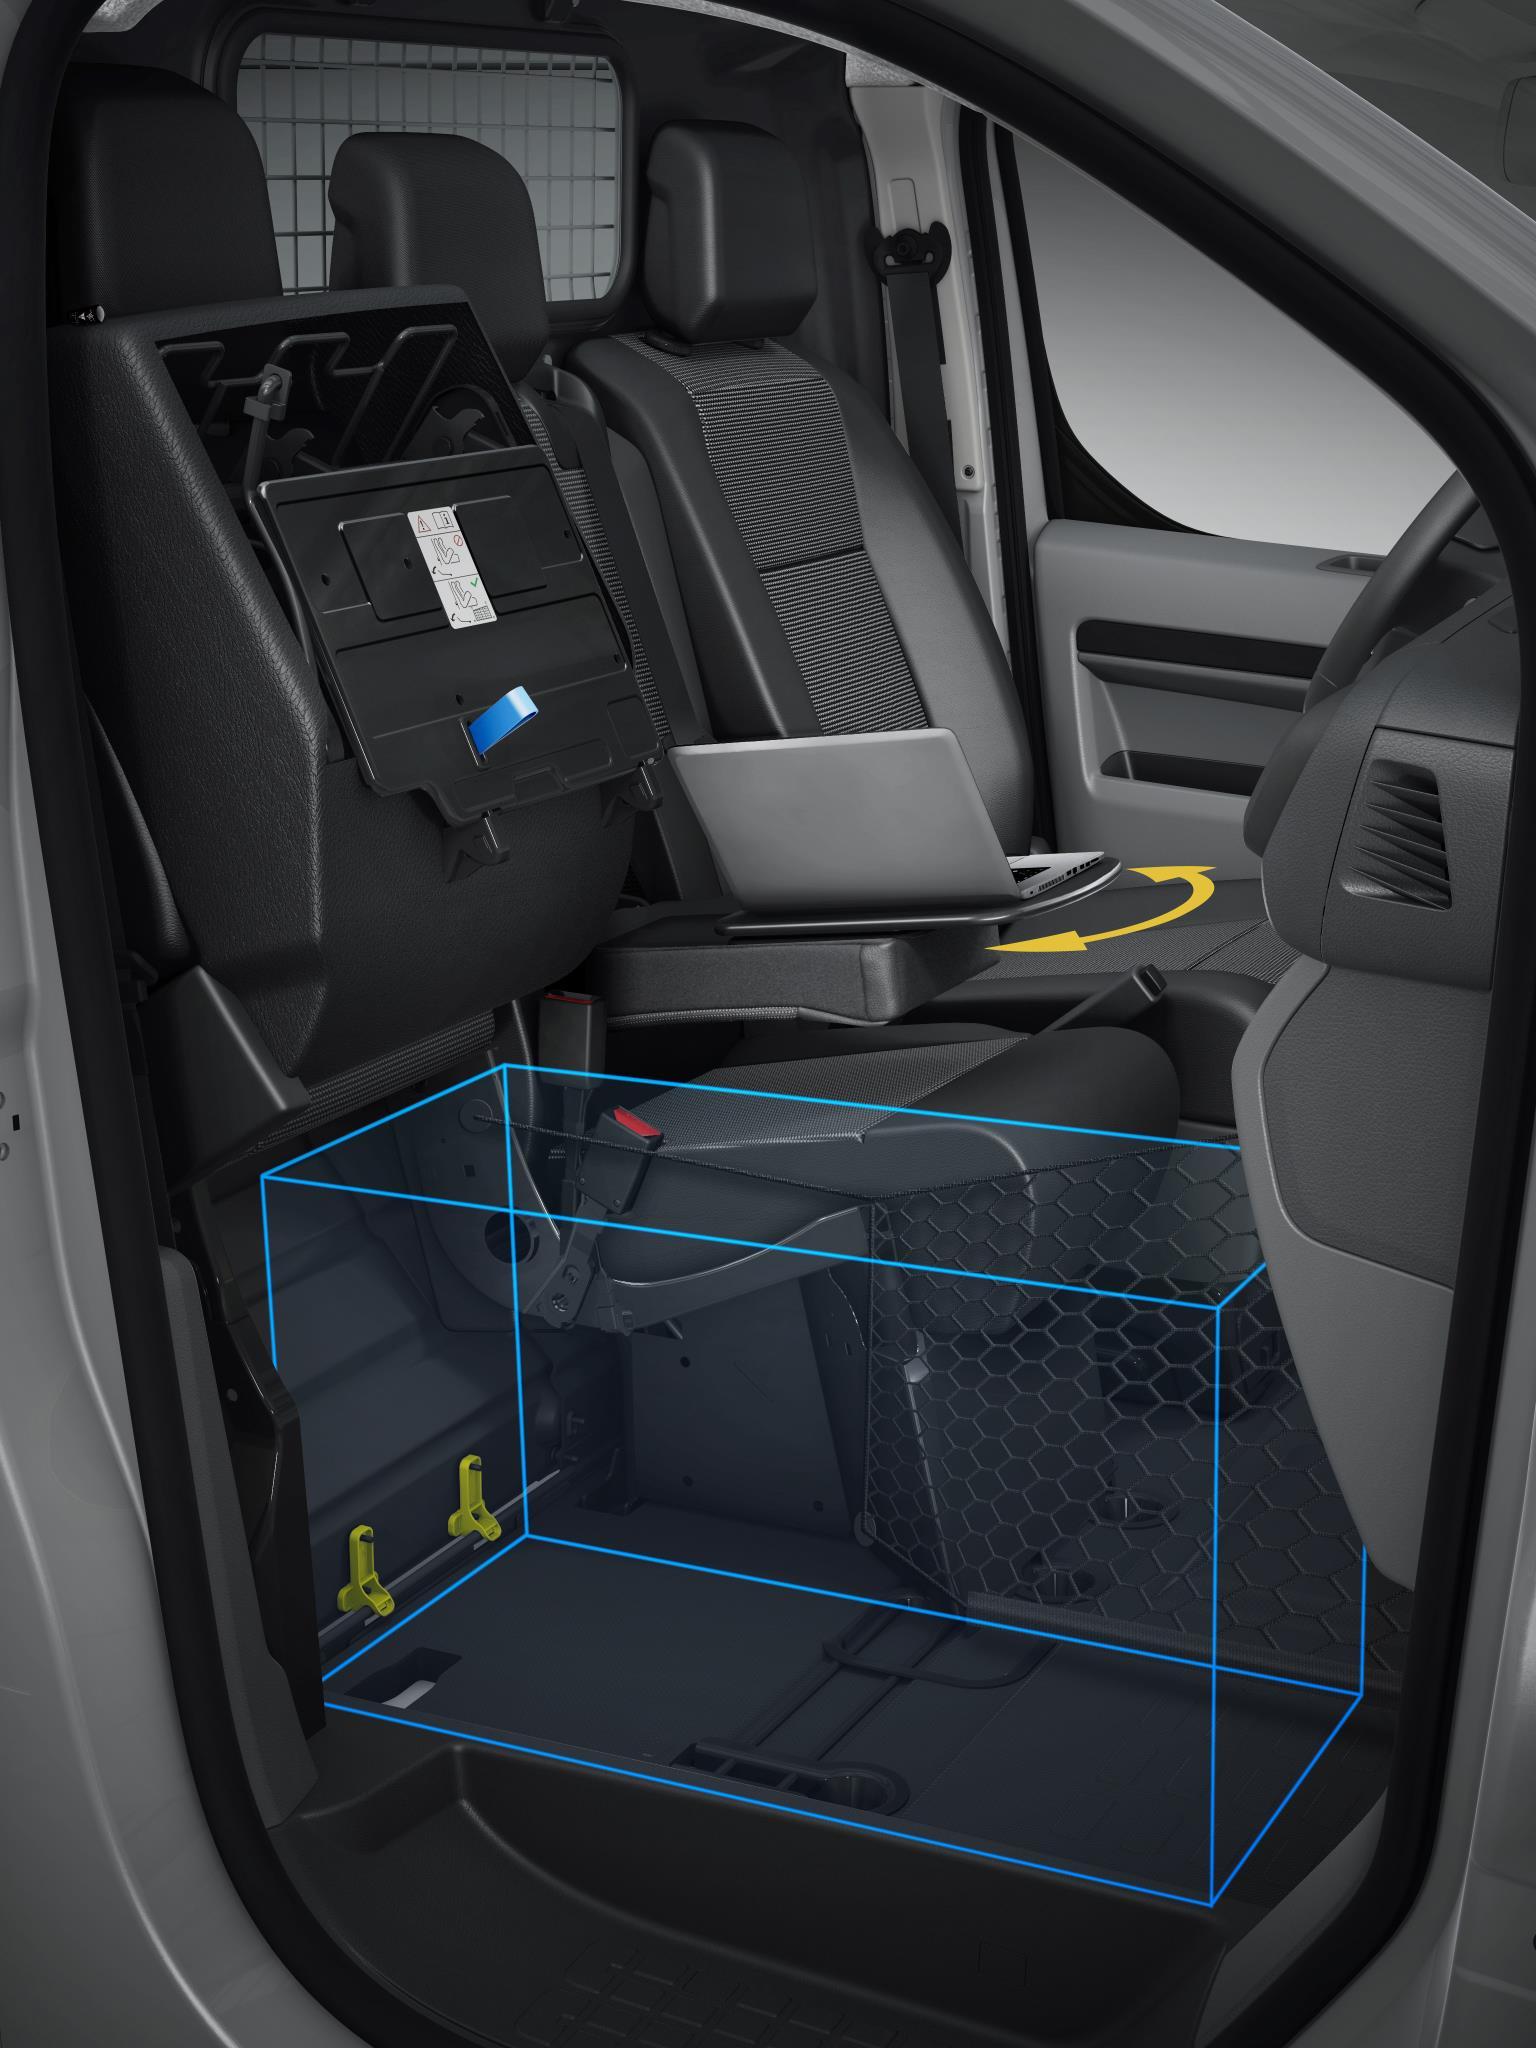 2016 peugeot expert promises class leading fuel economy autoevolution. Black Bedroom Furniture Sets. Home Design Ideas